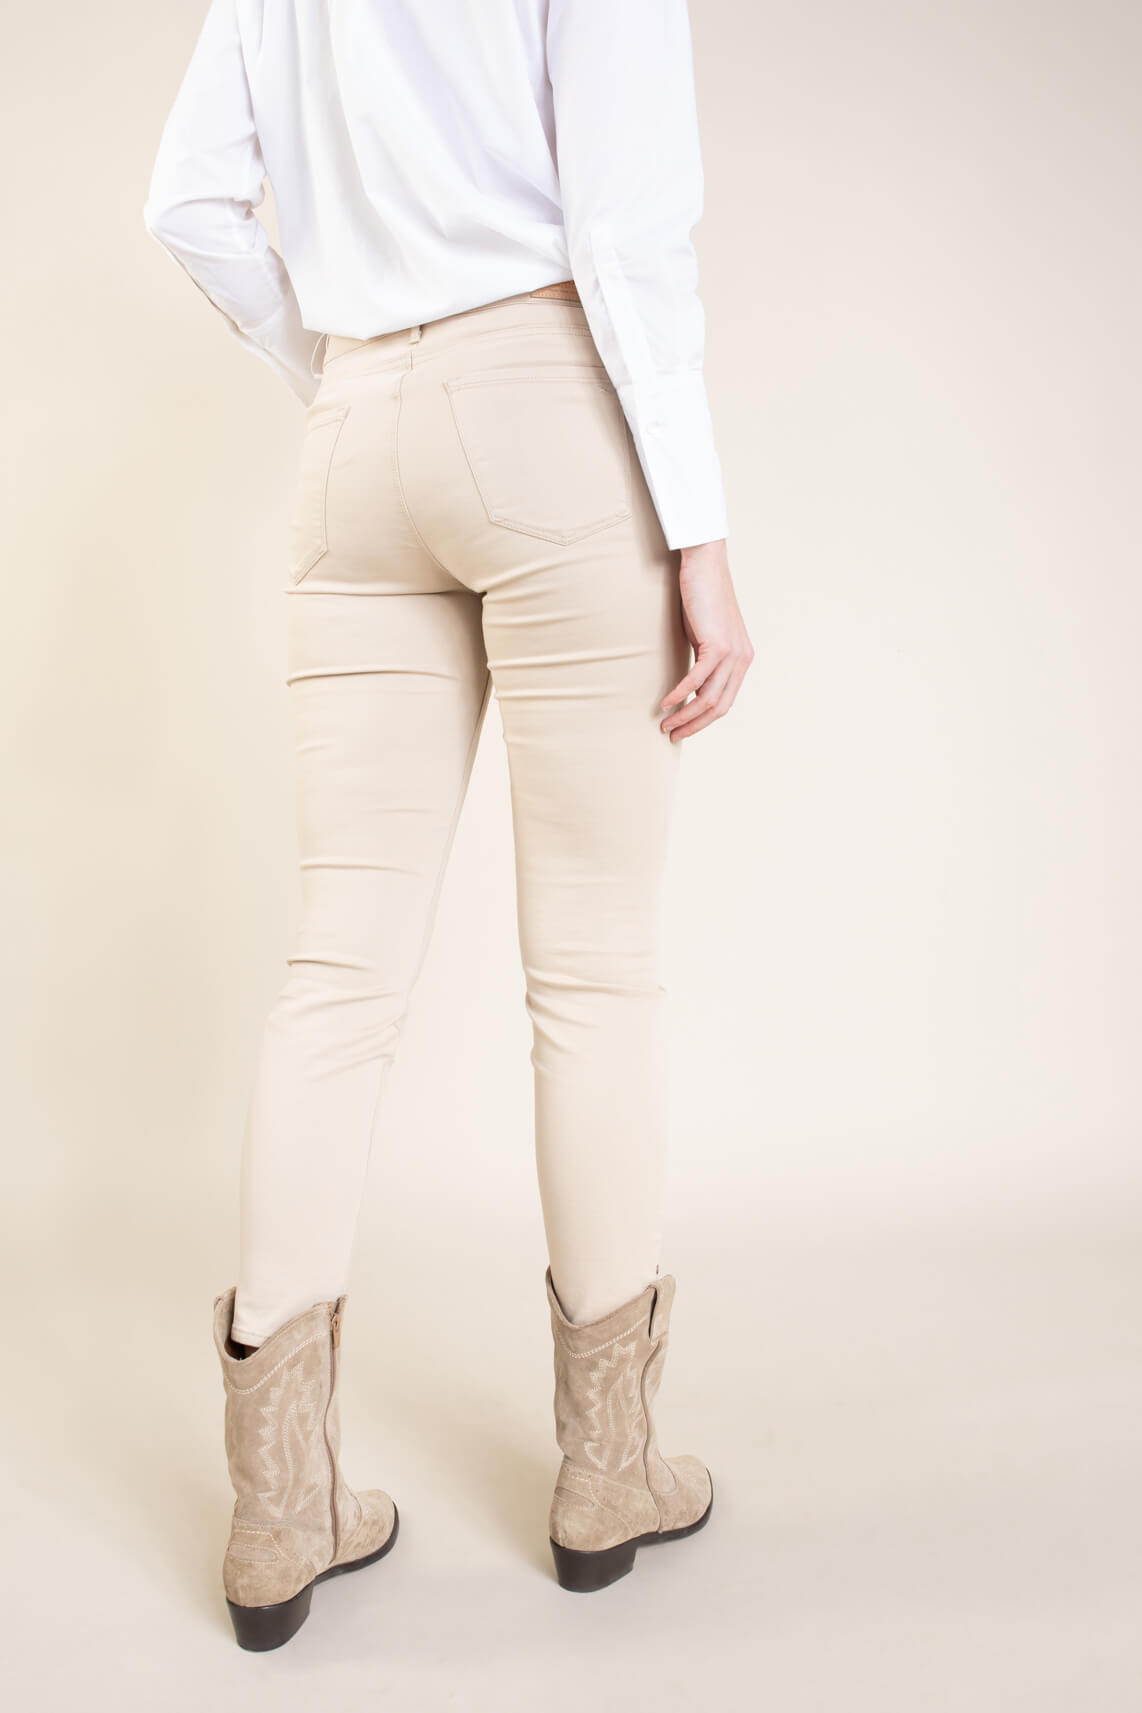 Brax Finest Dames Shakira skinny broek Bruin